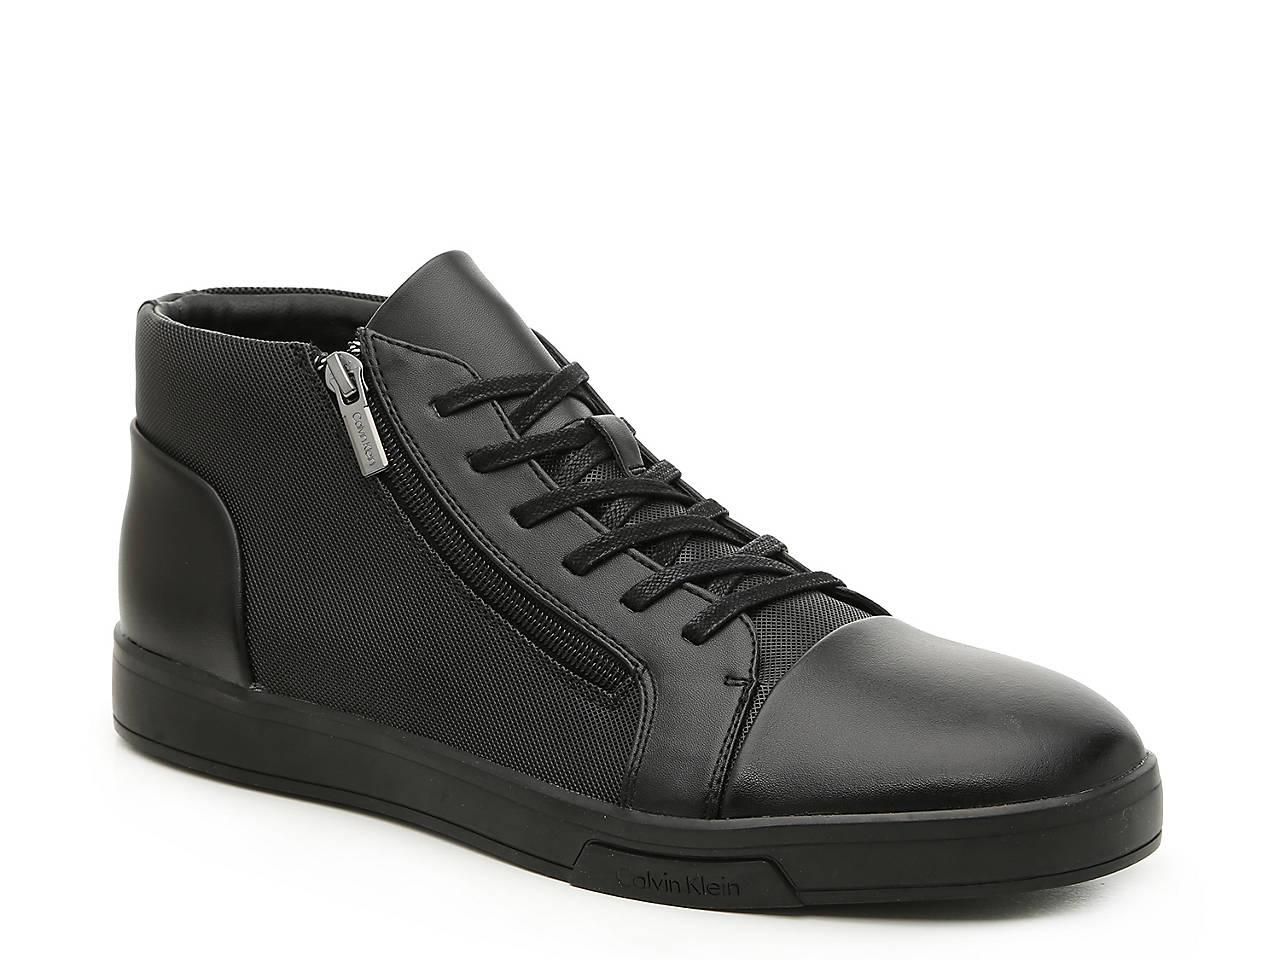 69b2cda8bed Baris High-Top Sneaker